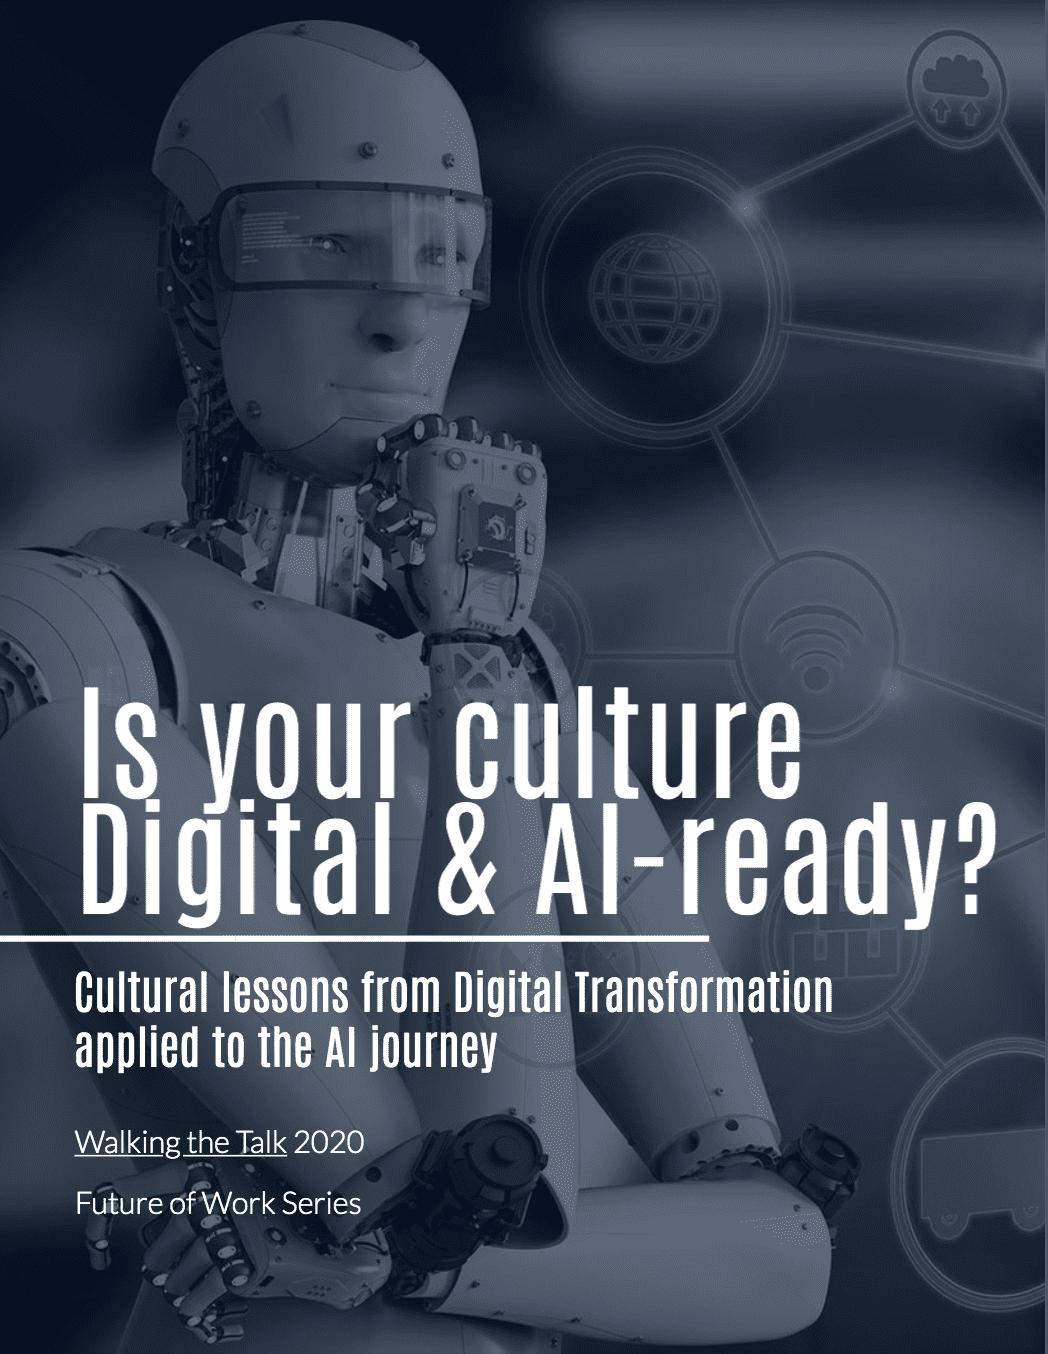 Digital transformation and AI